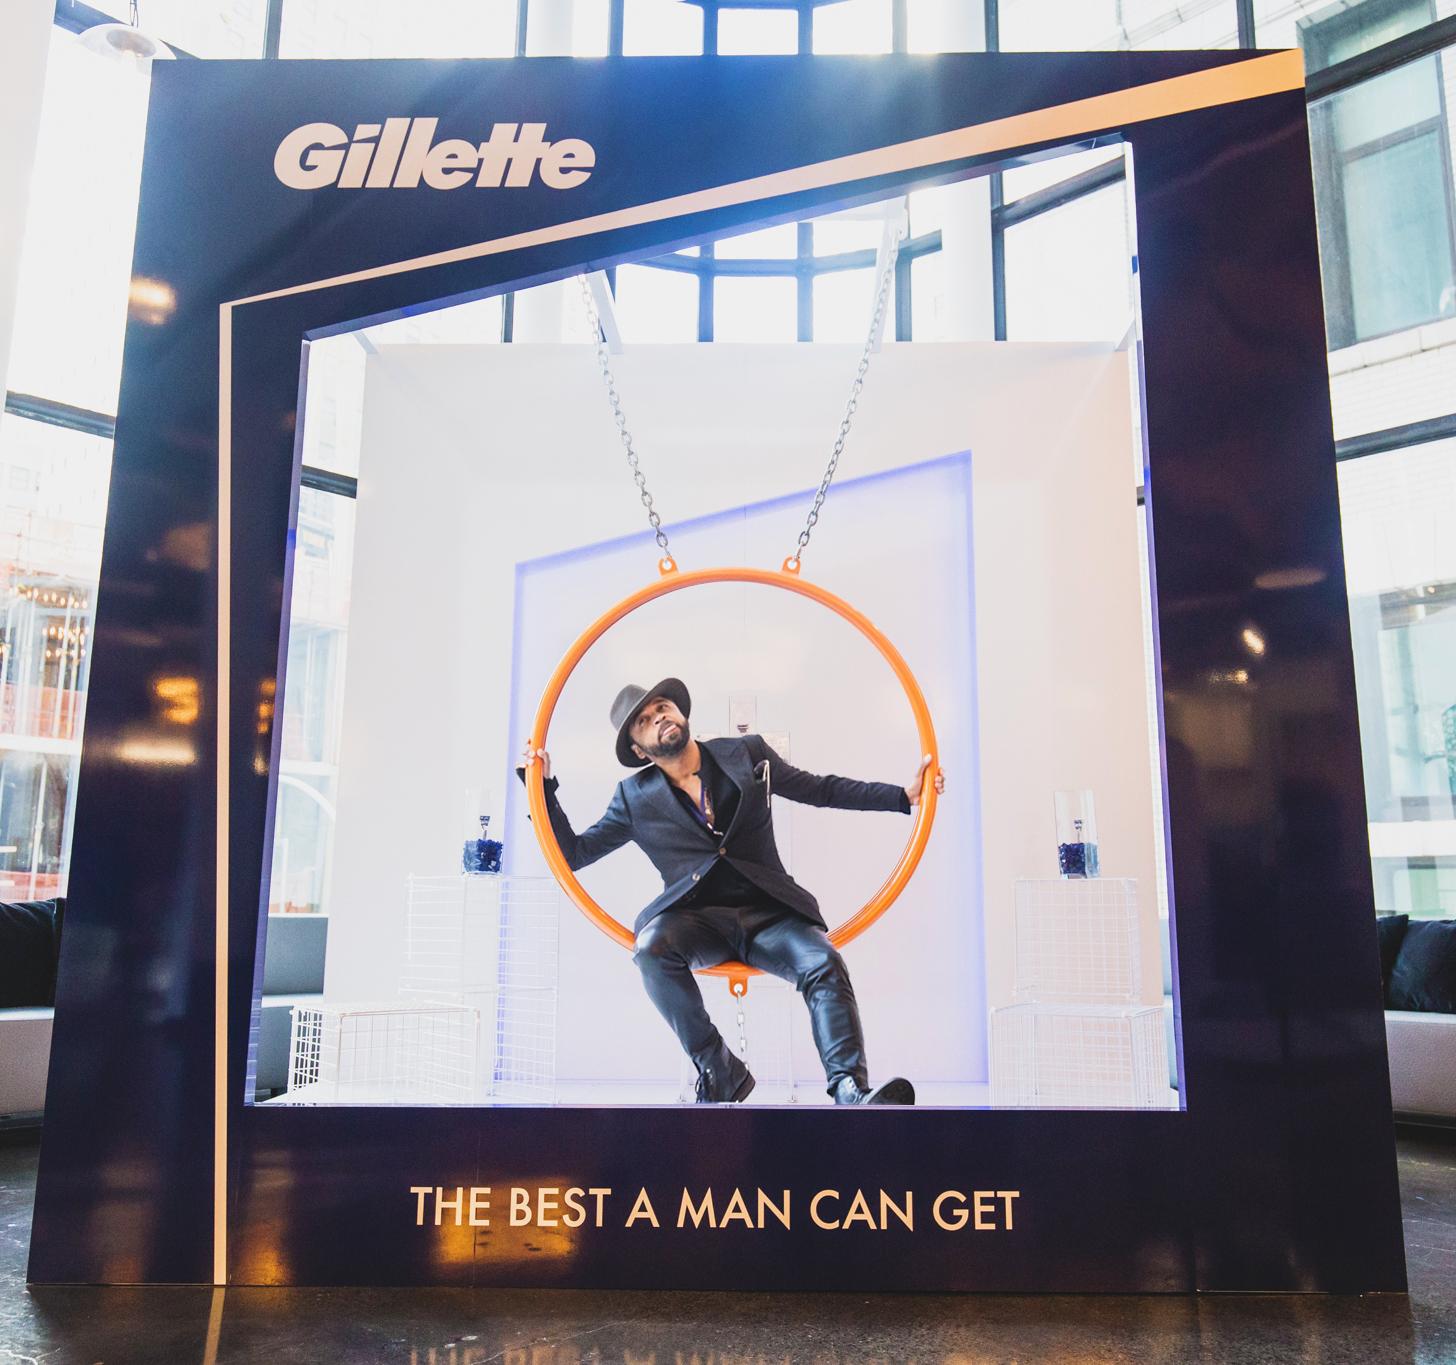 GILLETTE GLOBAL SUMMIT 2018